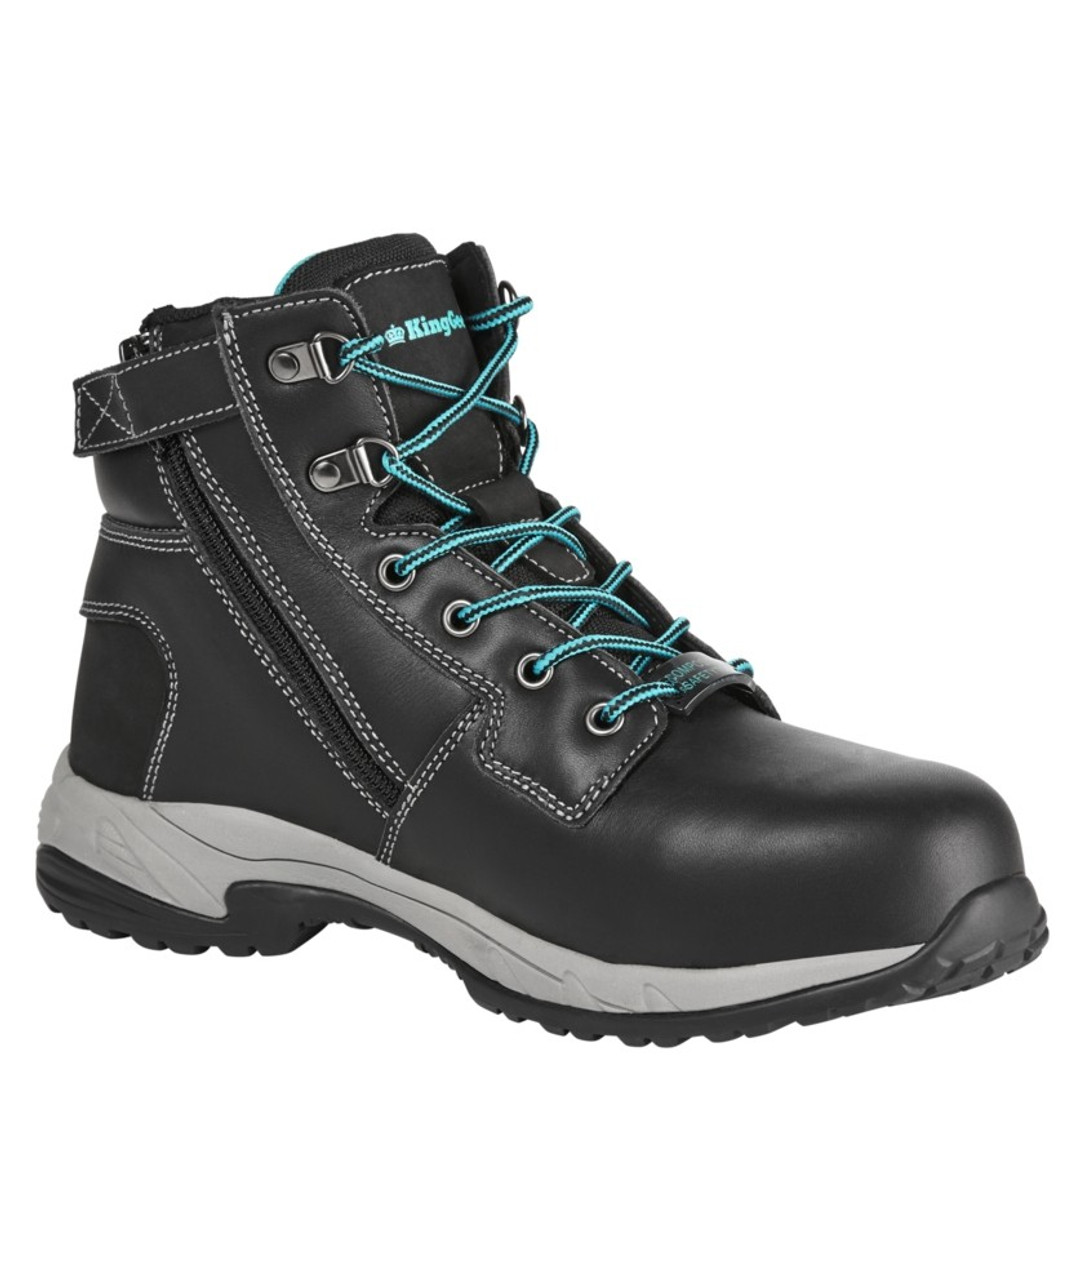 b27e34544ee KingGee Women's Tradie Zip Safety Work Boots in Black Full Grain ...